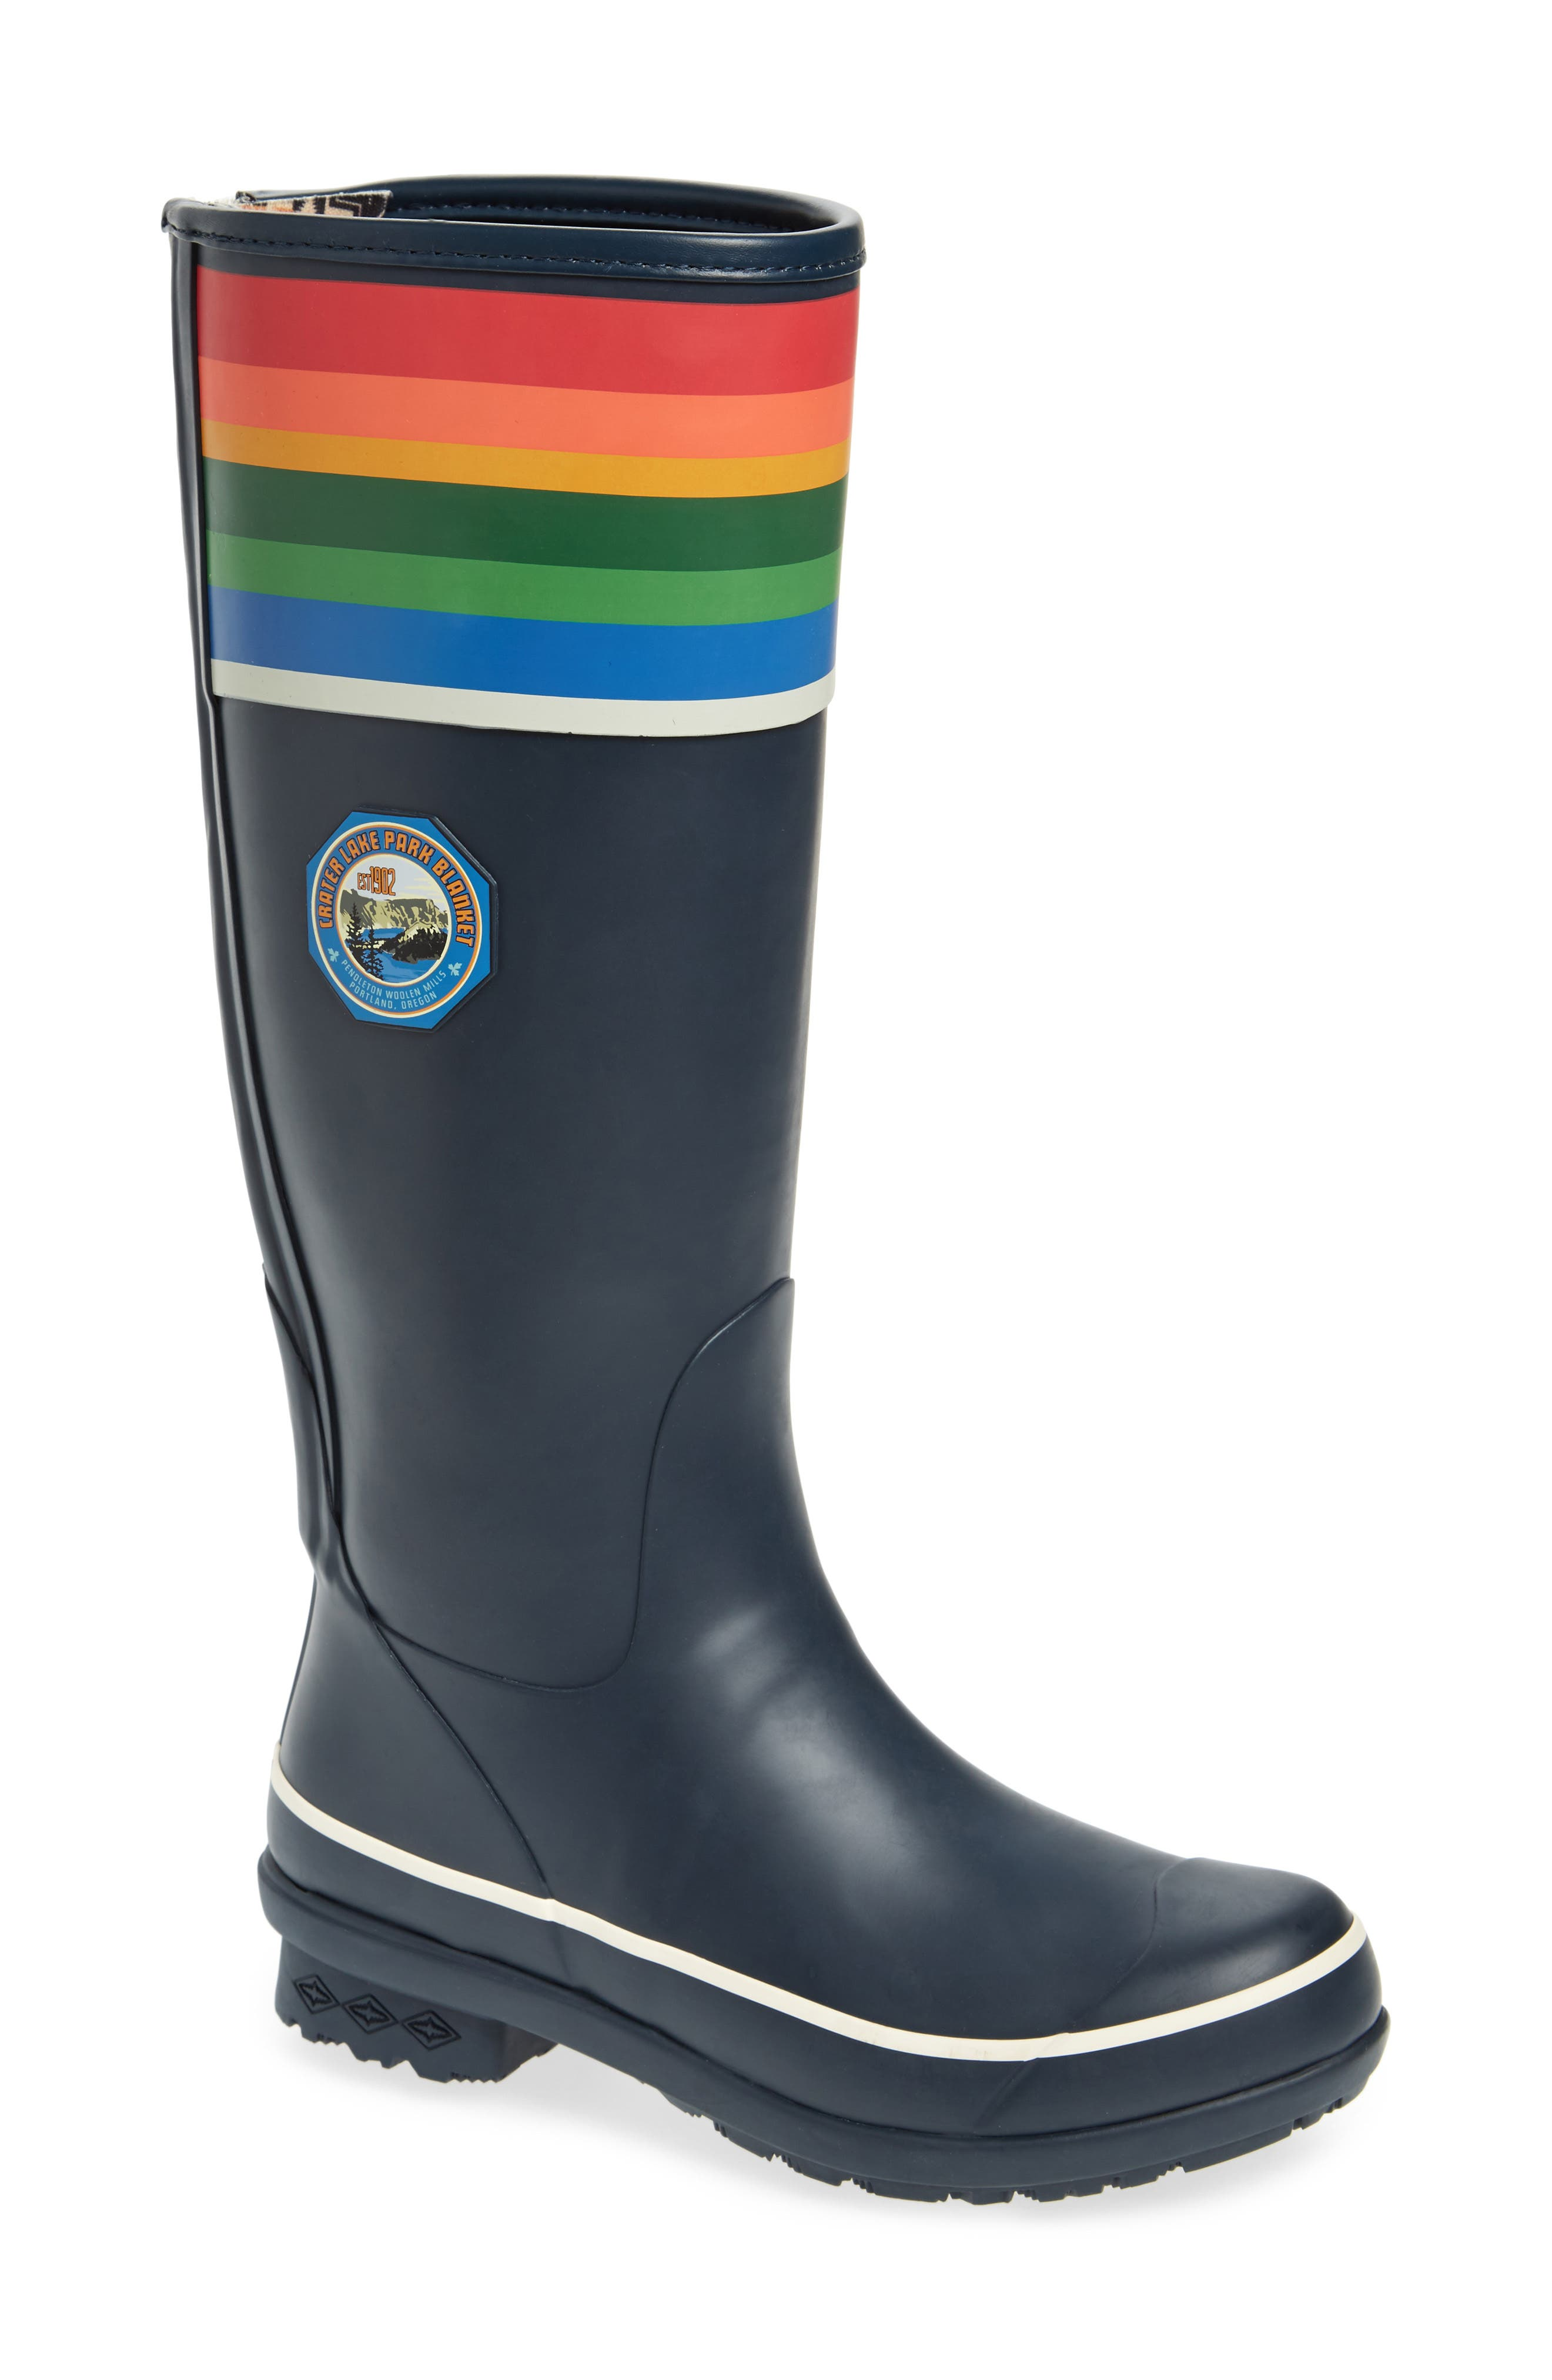 Pendleton Crater Lake National Park Tall Rain Boot,                             Main thumbnail 1, color,                             Blue